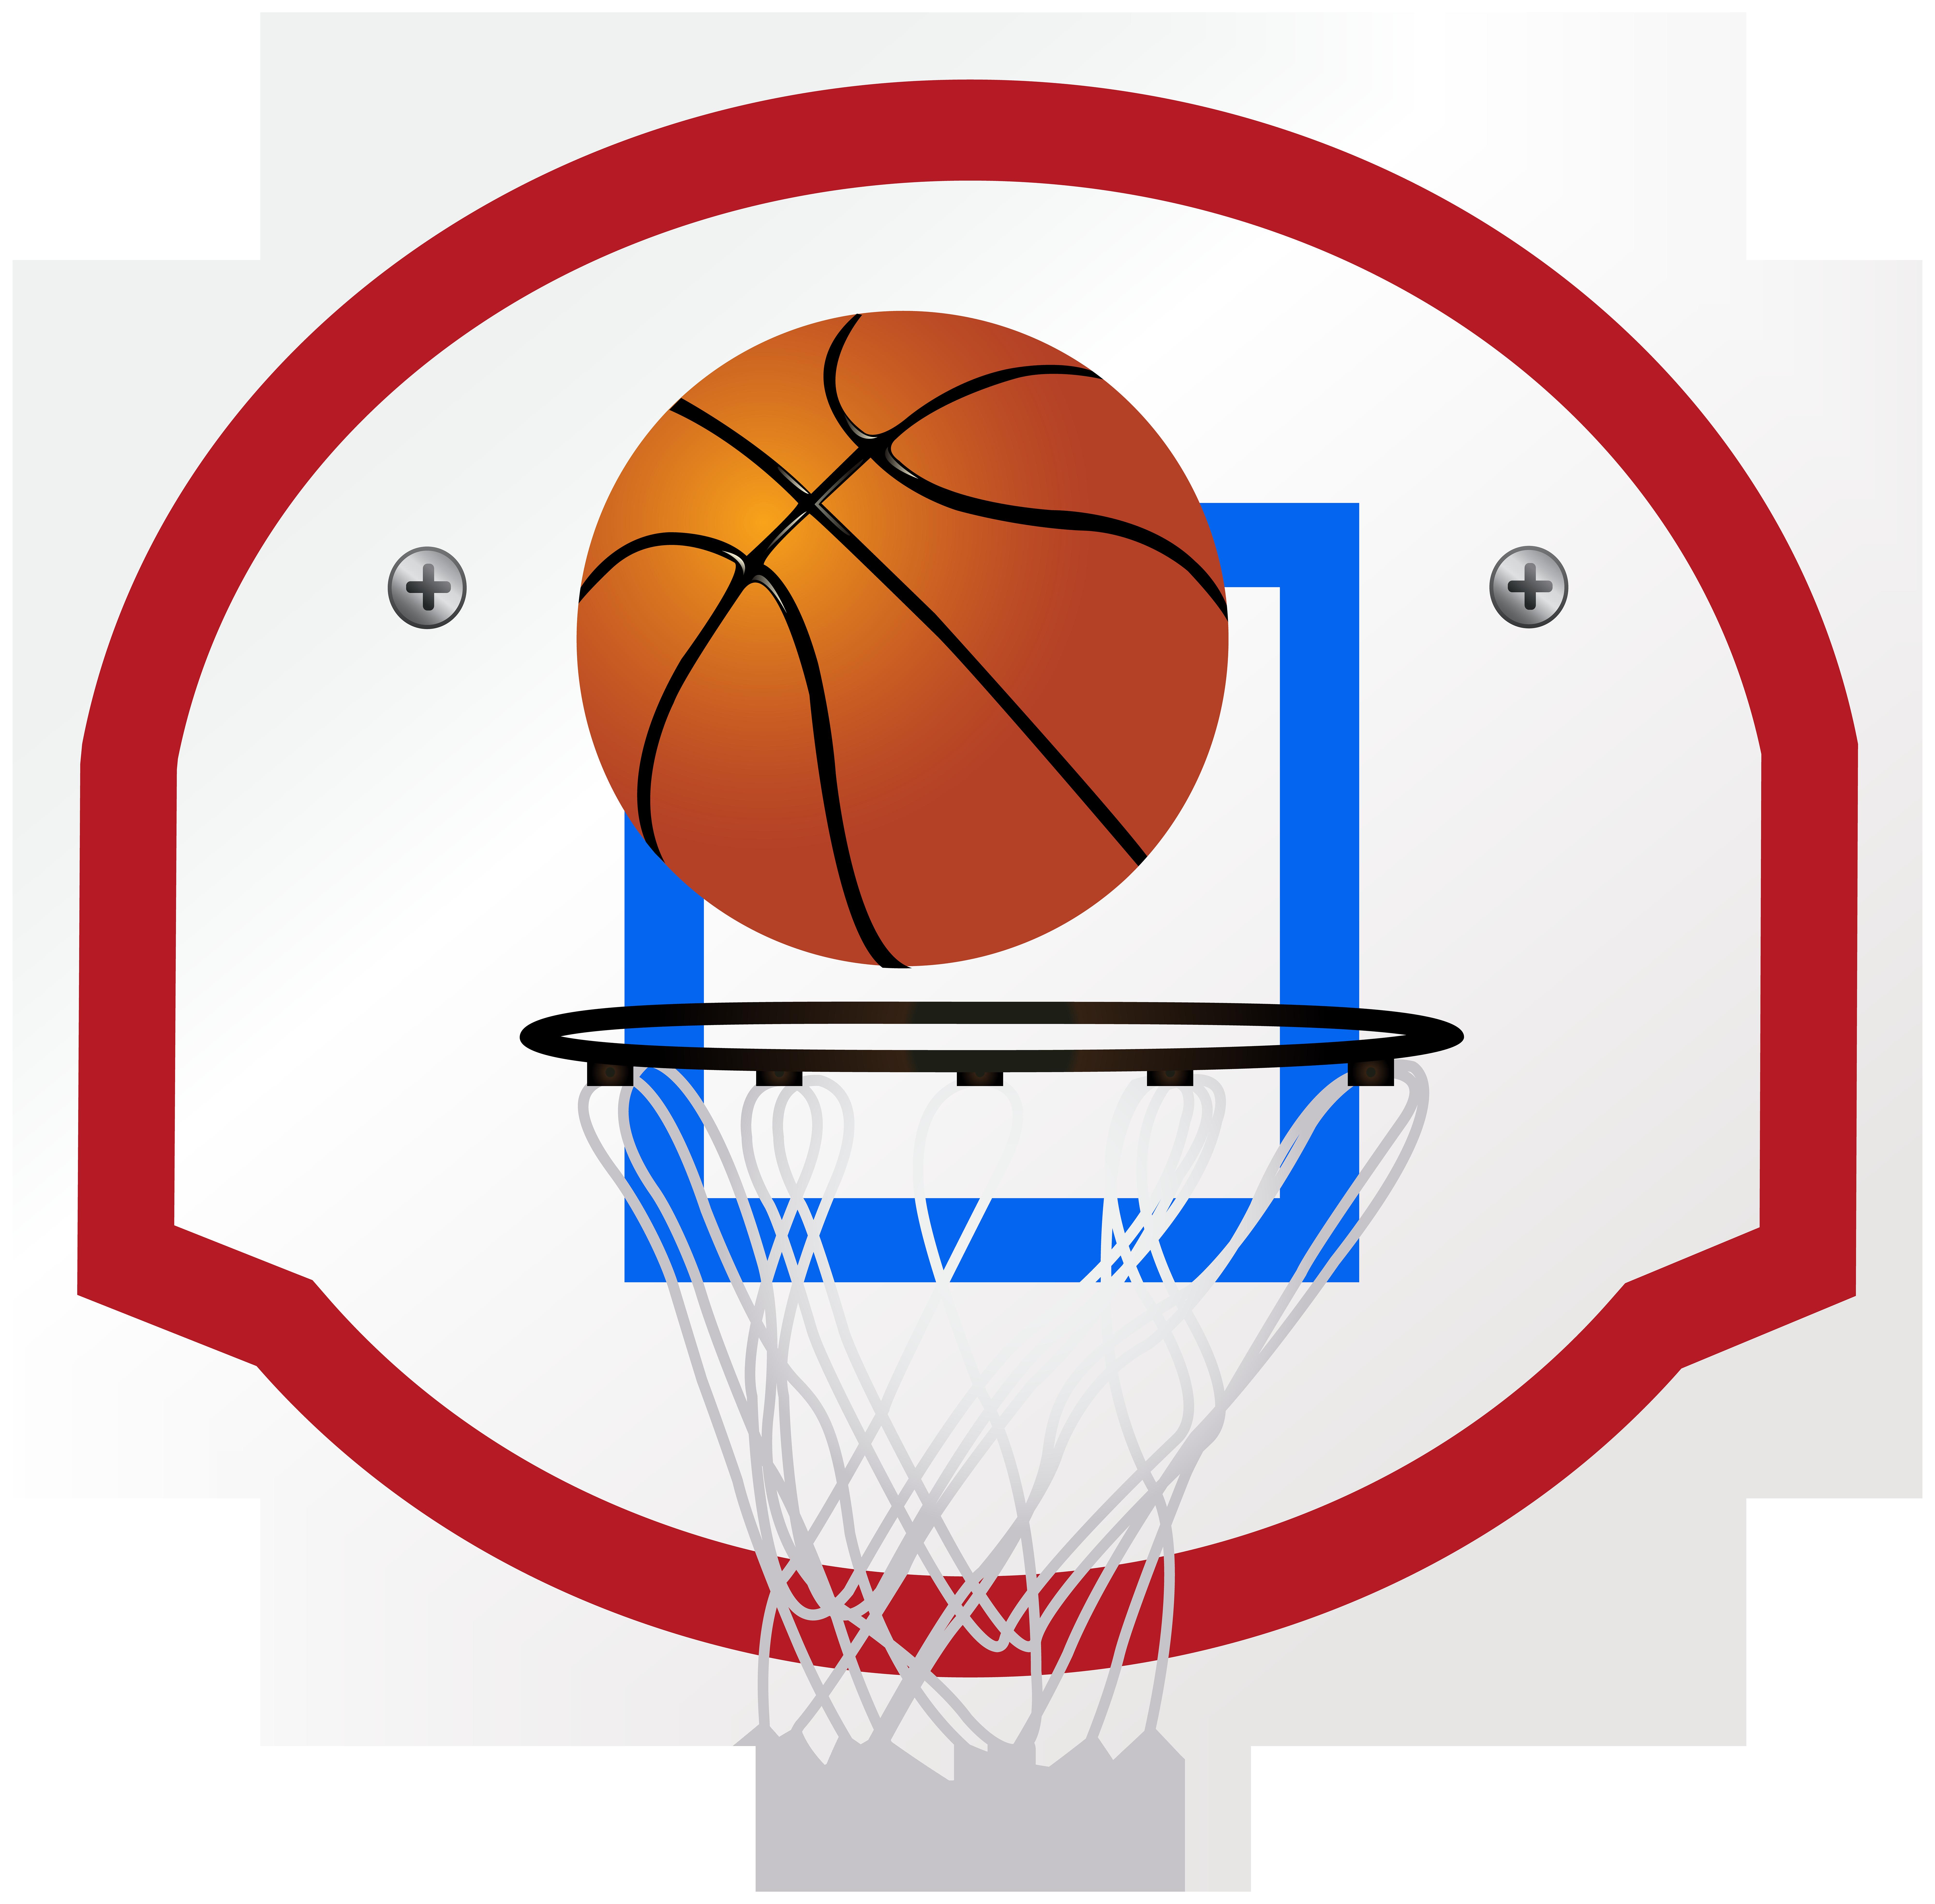 Hoop png clip art. Pirates clipart basketball